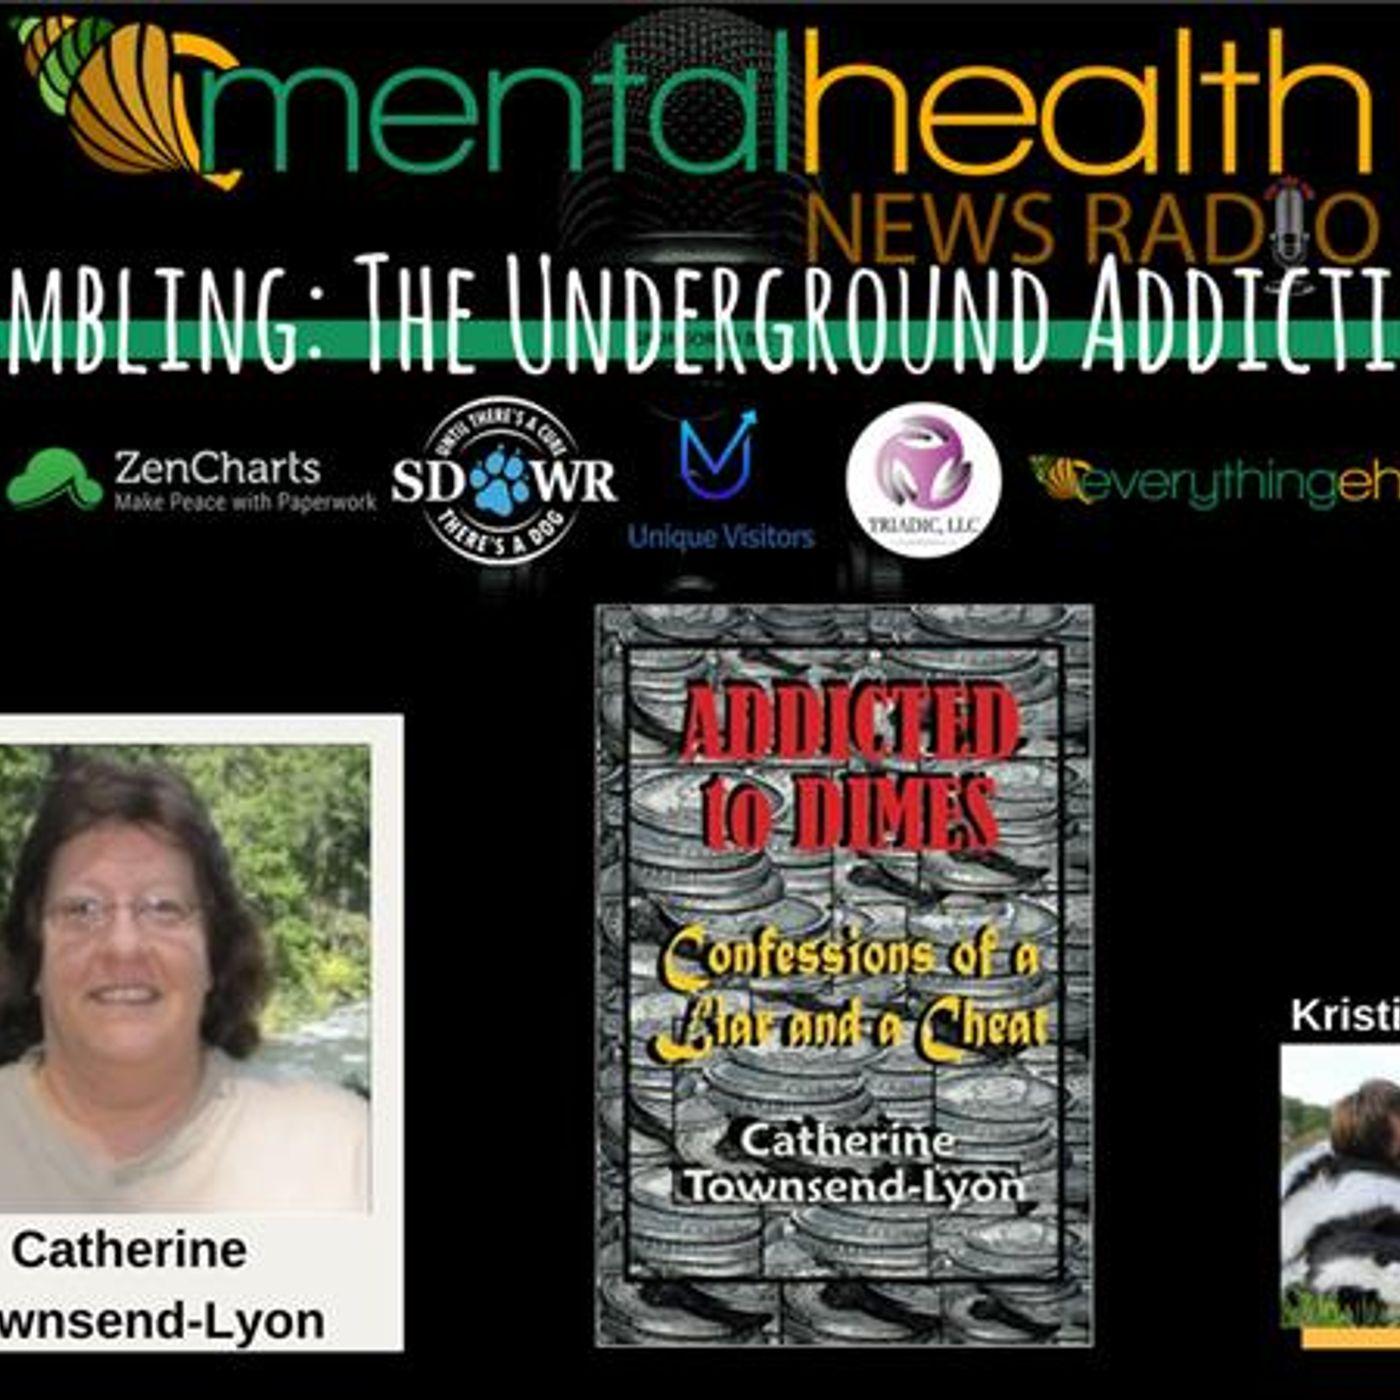 Mental Health News Radio - Gambling: The Underground Addiction with Author Catherine Townsend-Lyon